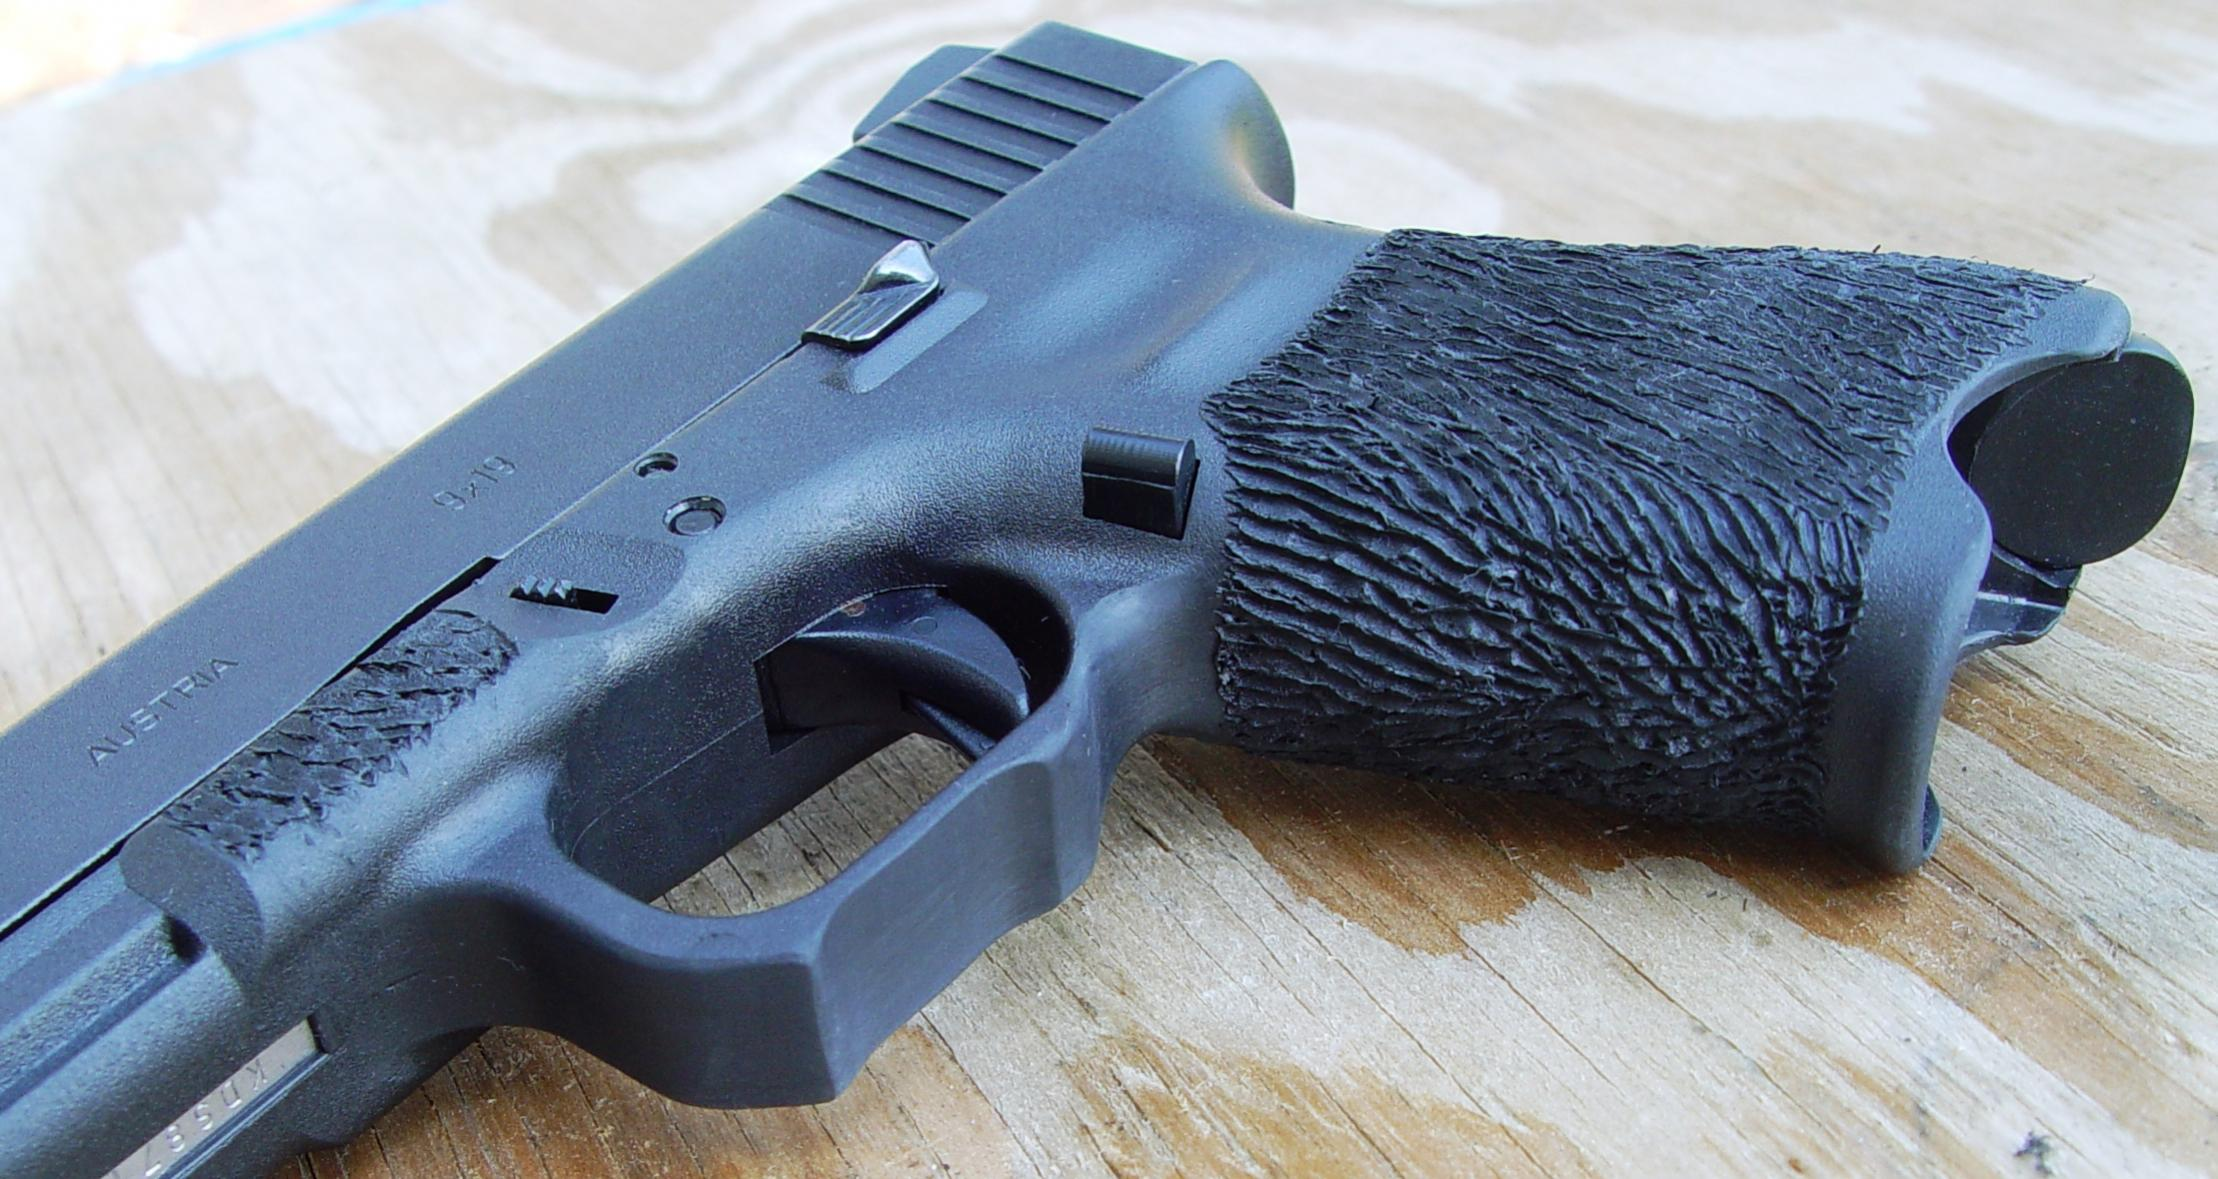 Glock Trigger Guard Mod-round-trigger-guard-g19.jpg